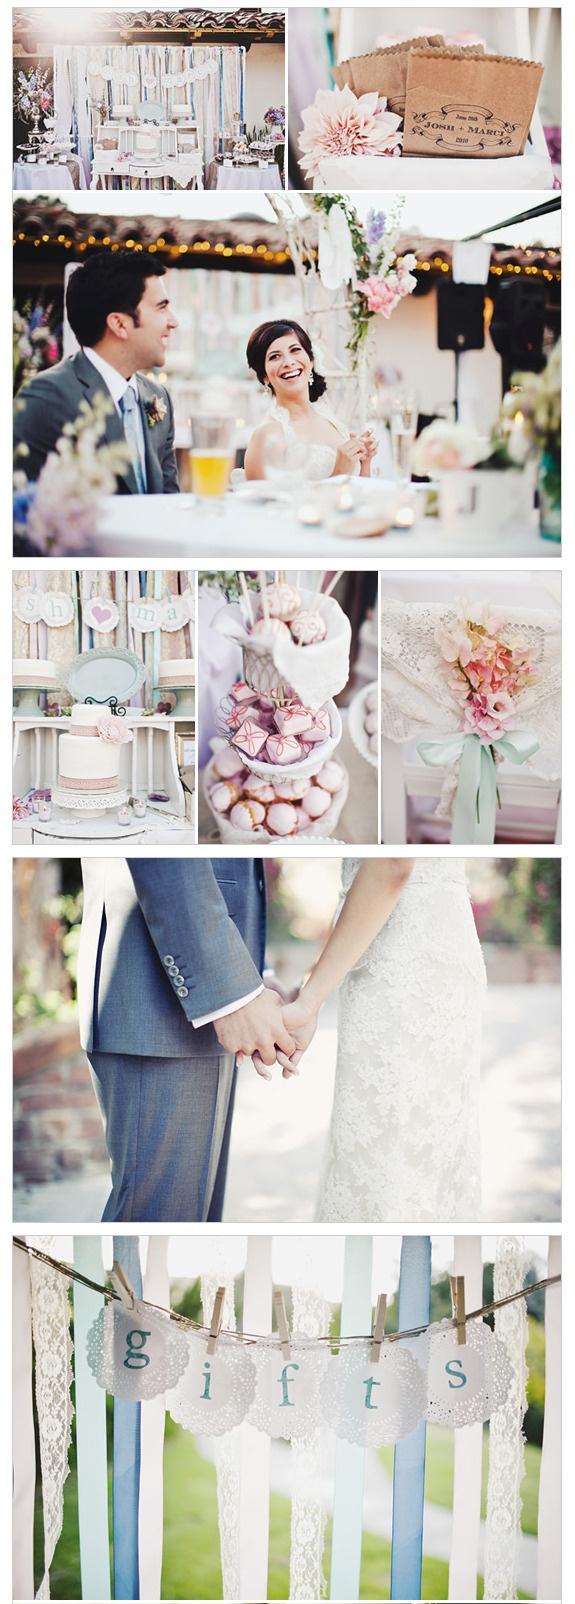 73 best Vintage weddings images on Pinterest | Vintage weddings ...